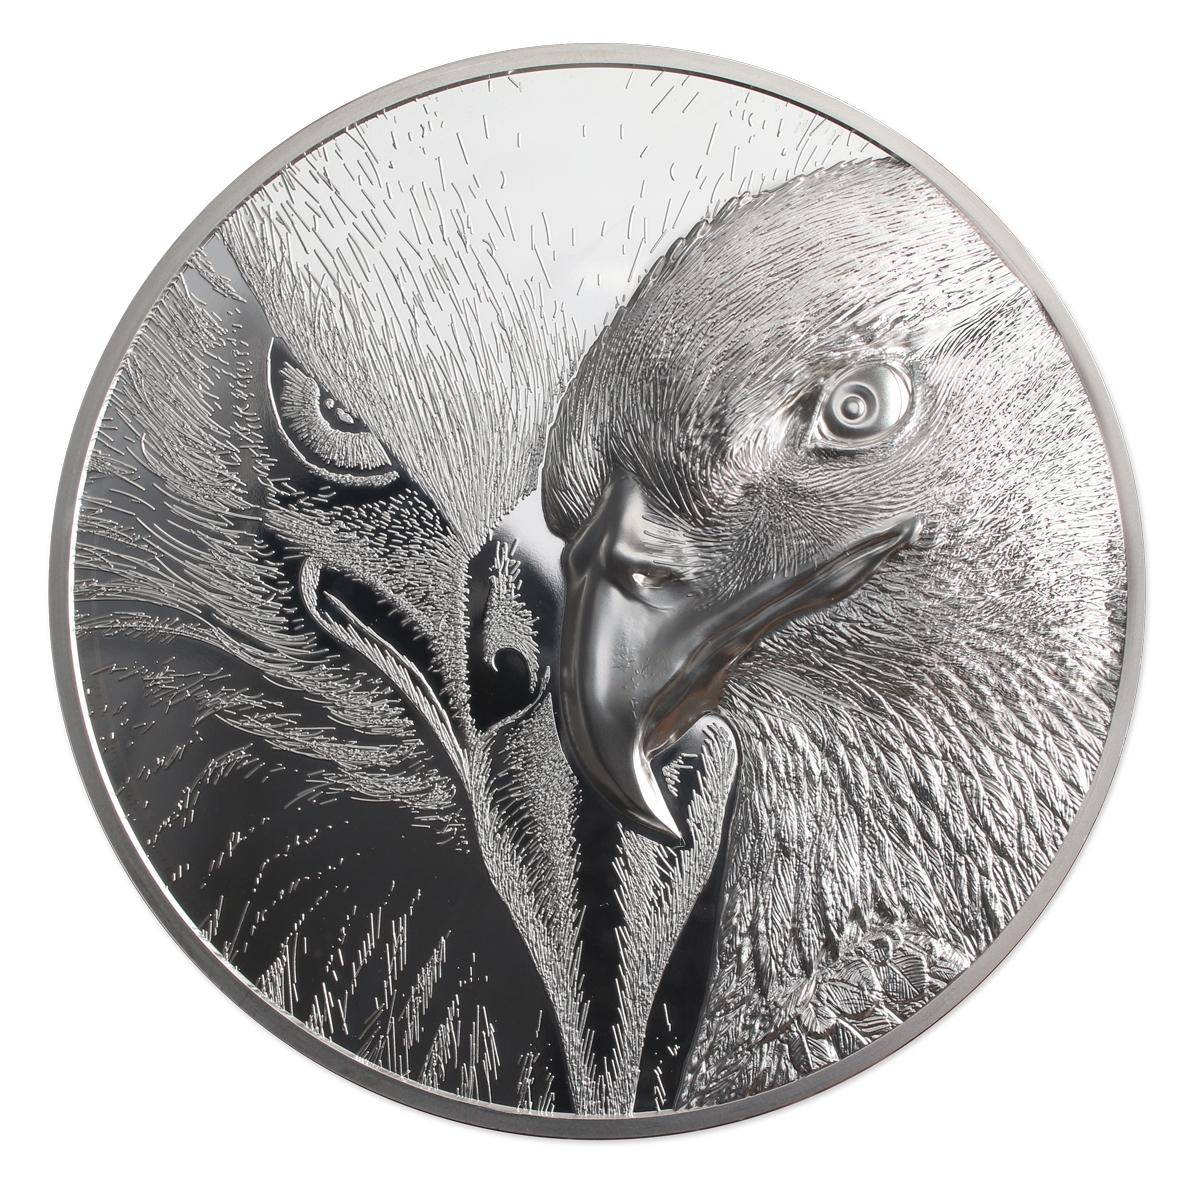 Mongolia - 2021 - 20000 Togrog - Majestic Eagle - 1 Kilo